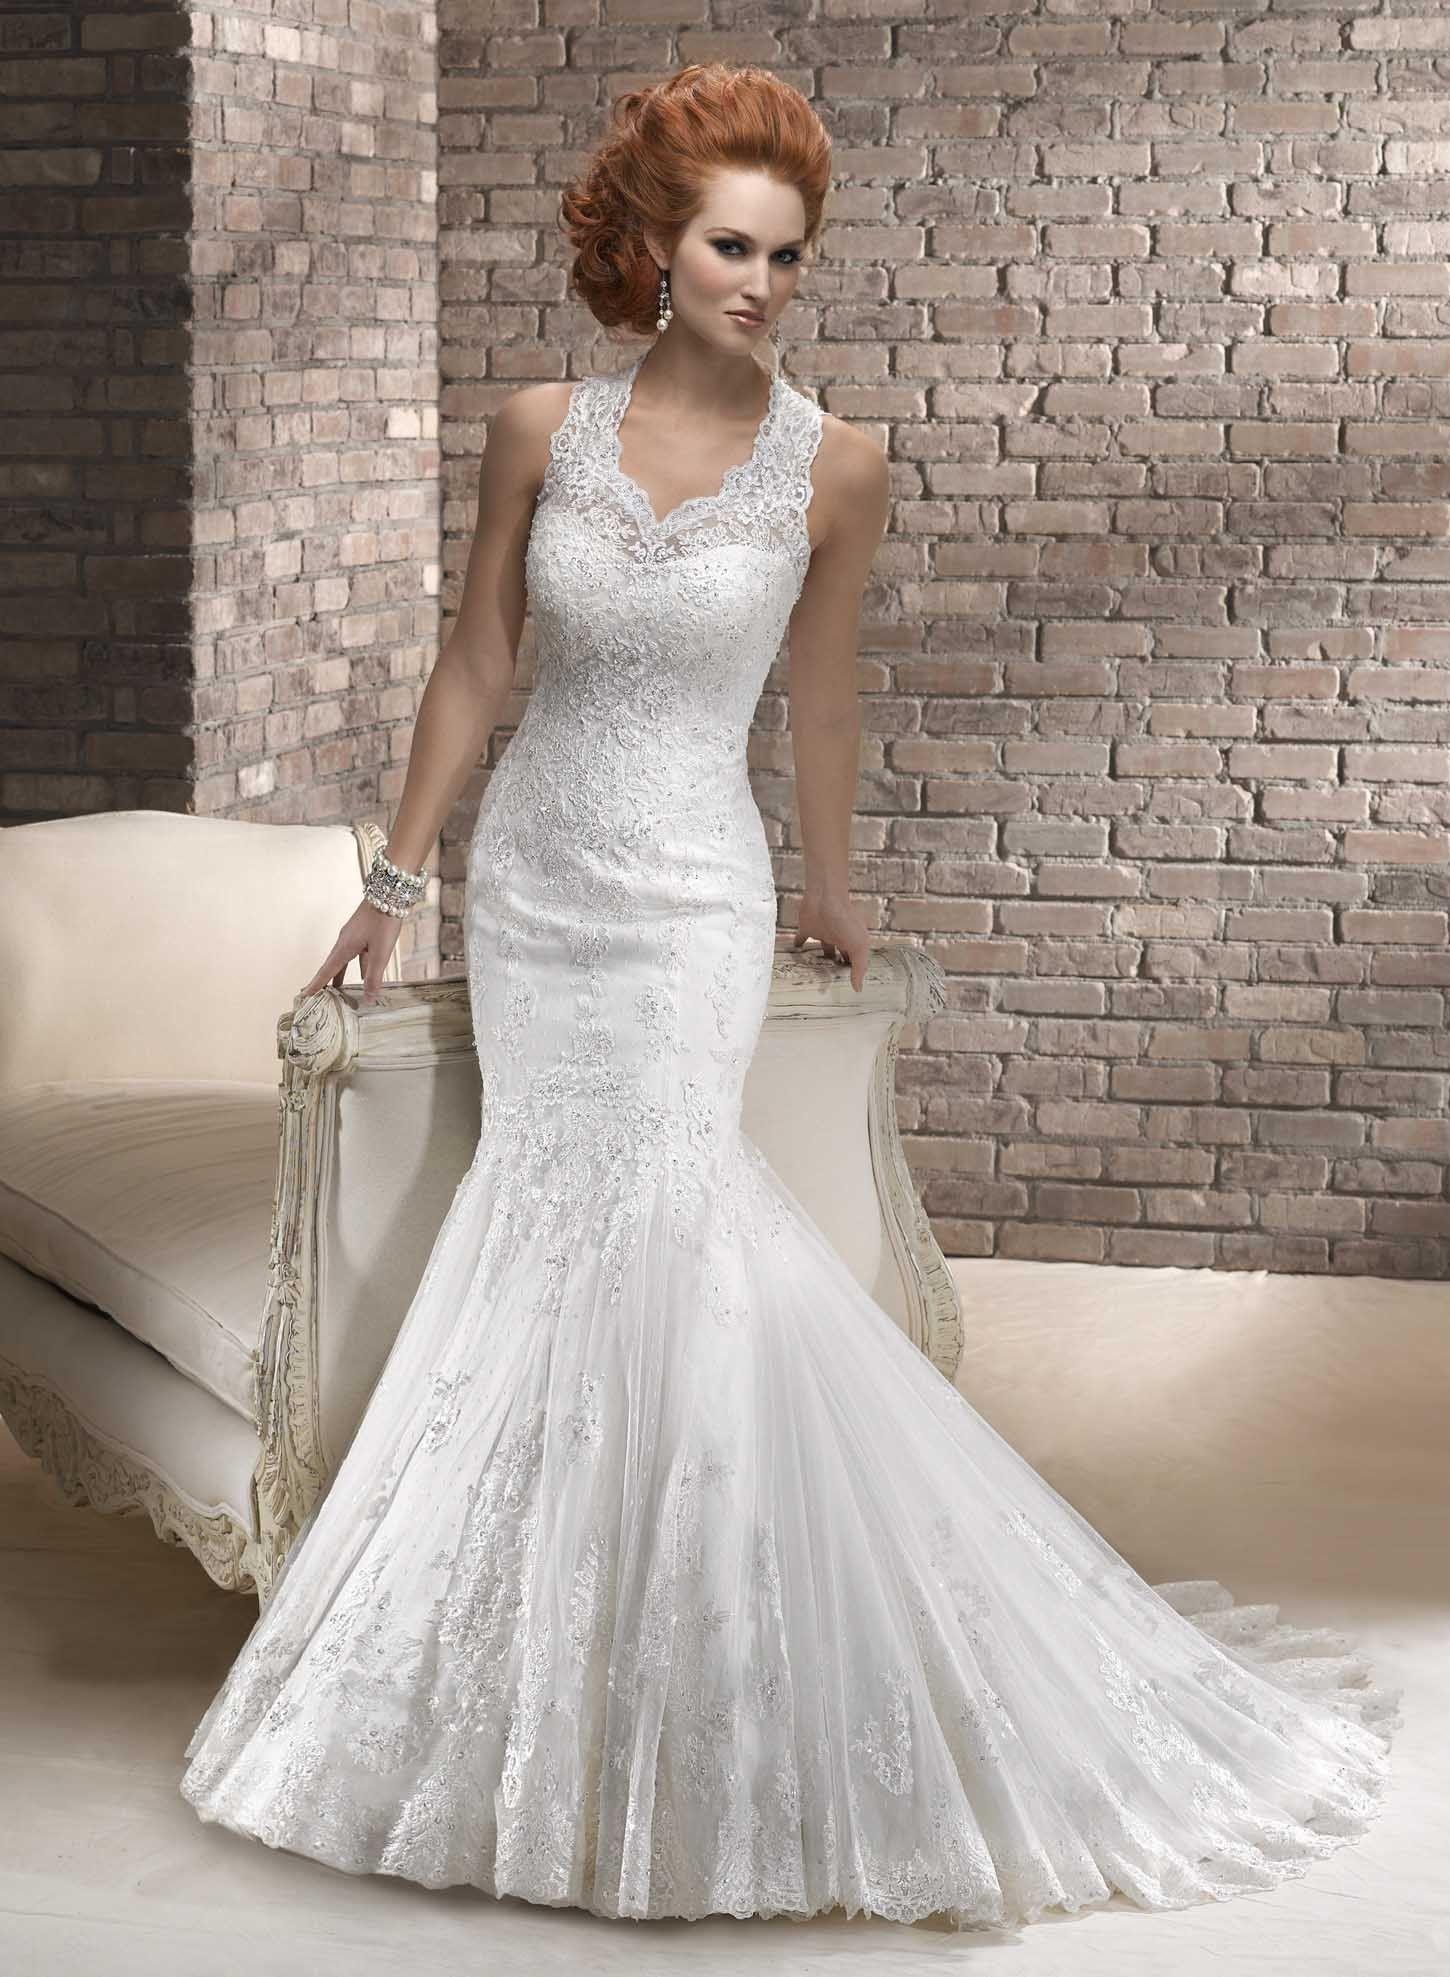 Fashion mermaid illusion neckline satin wedding dress wd